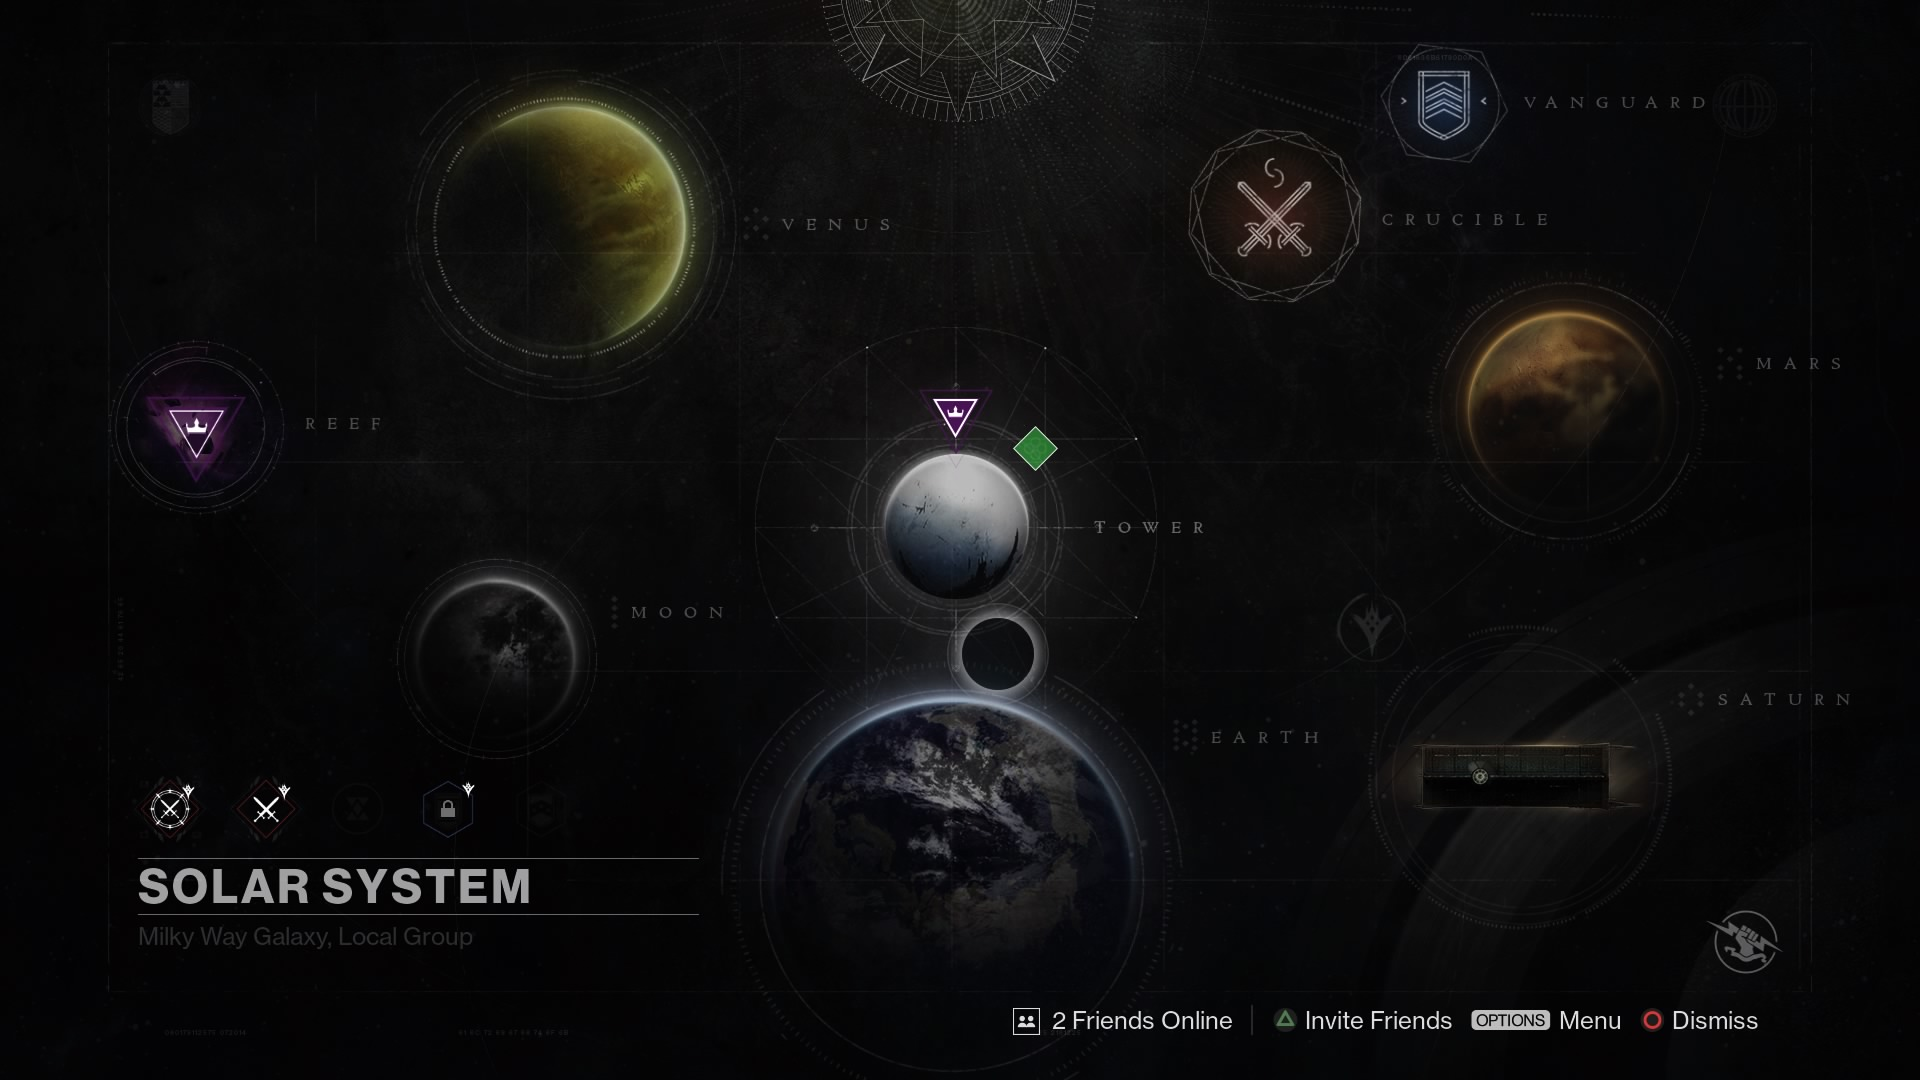 Destiny map in 2015